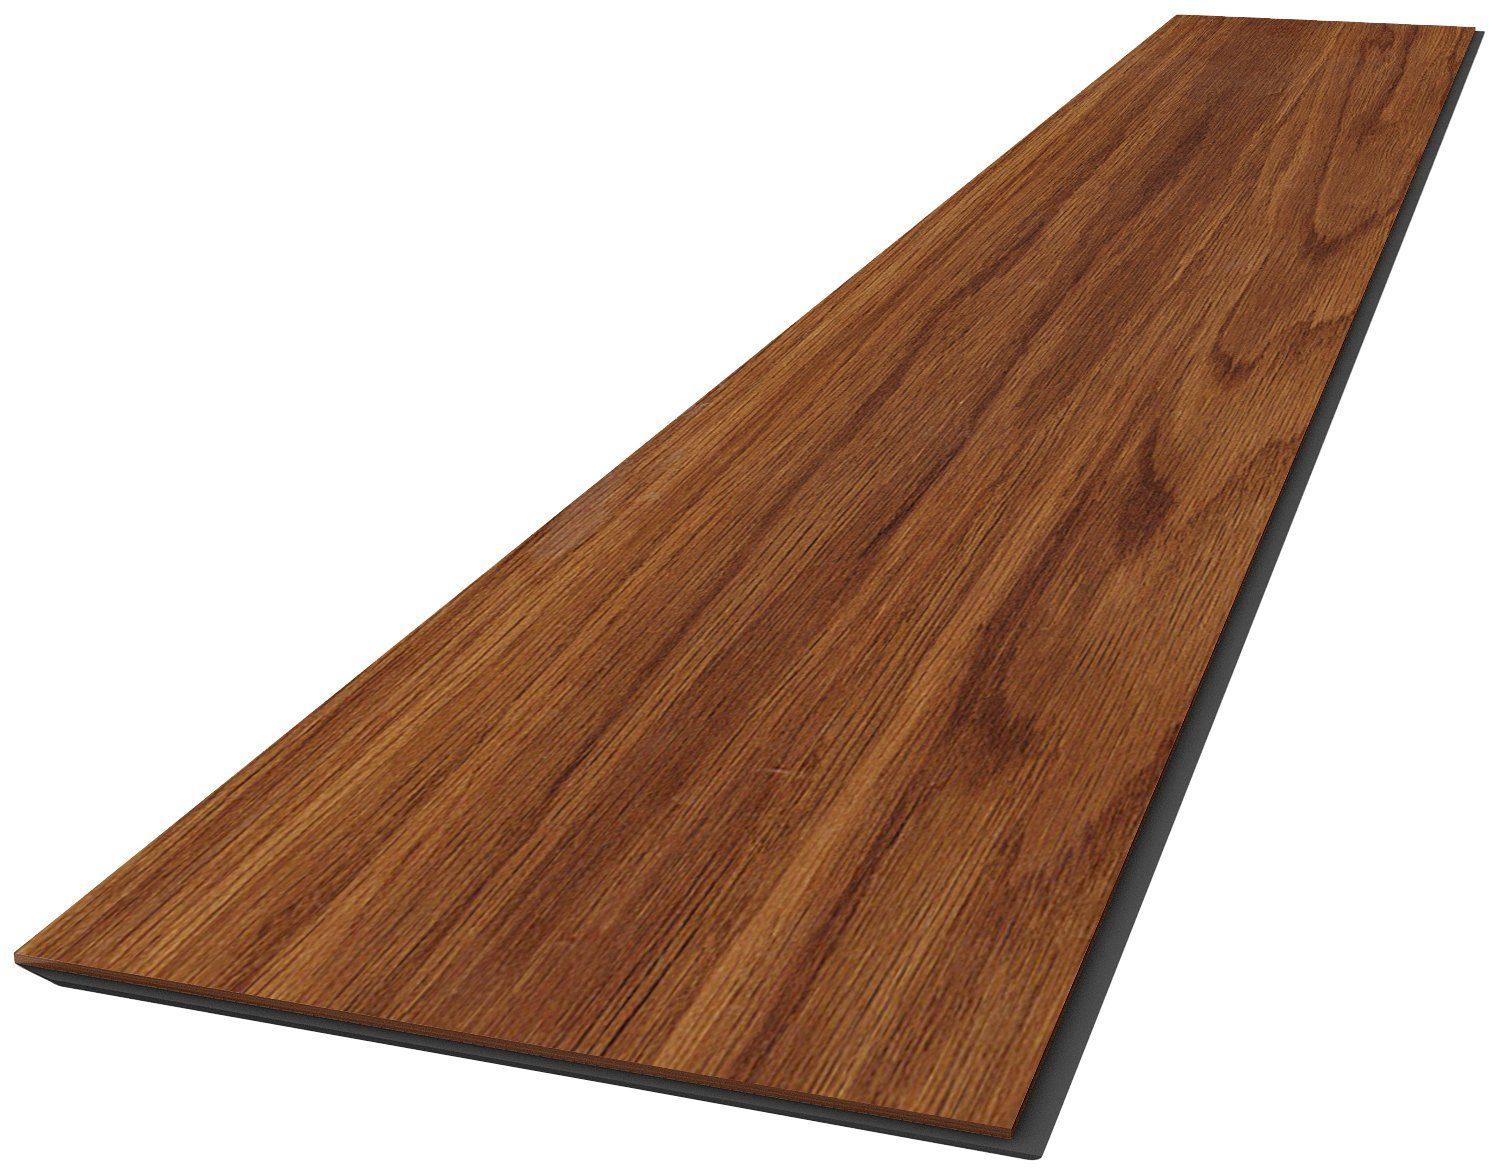 Vinyl Fußboden Toom ~ Pvc boden vinylboden kaufen vinyl laminat pvc fliesen otto